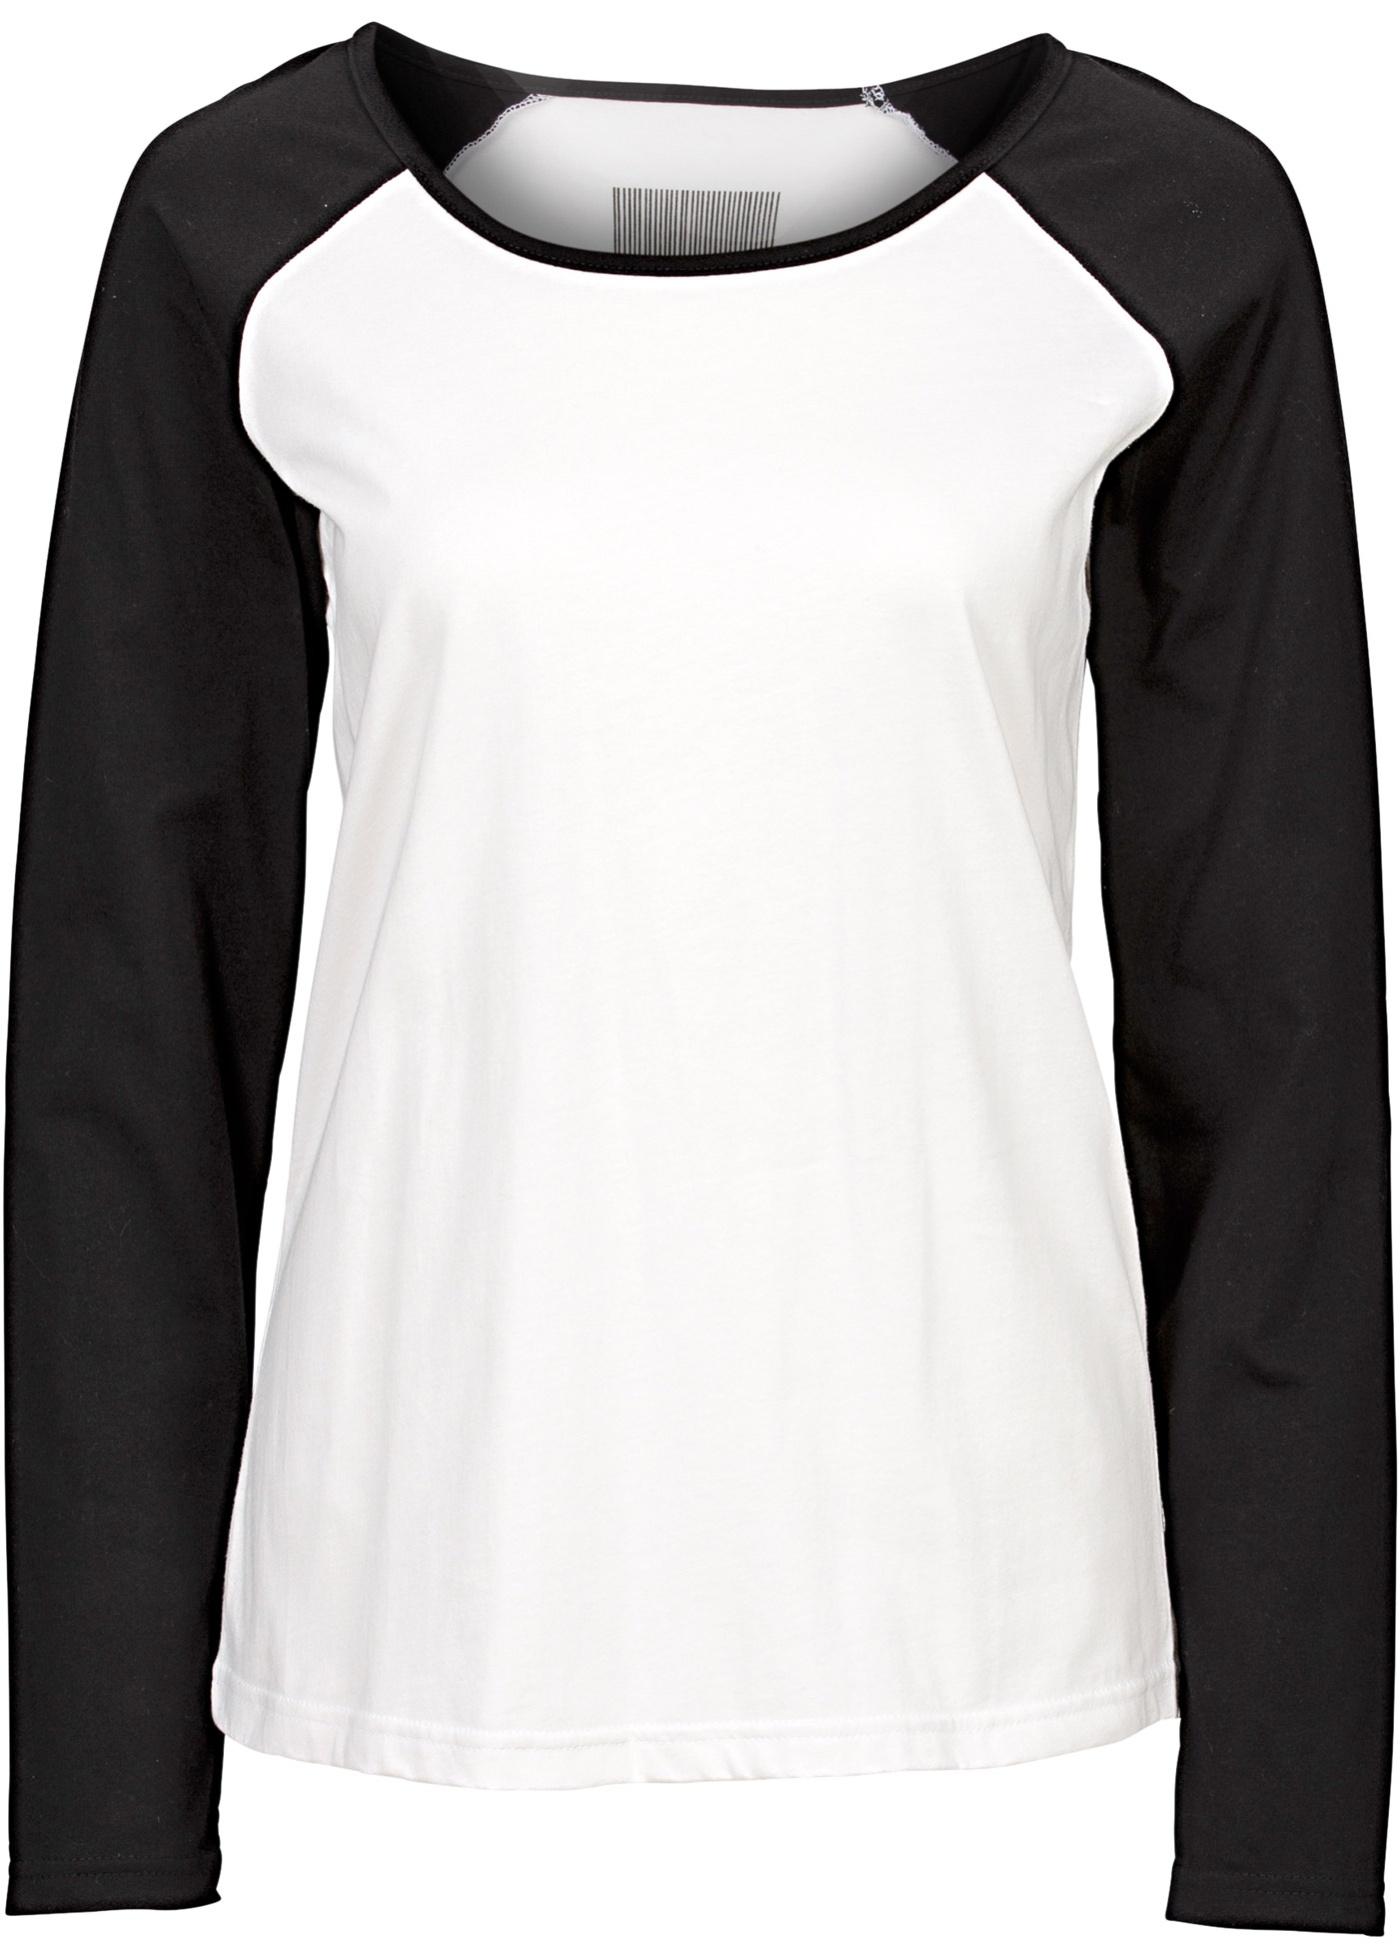 Camiseta raglan branca manga longa com decote redondo